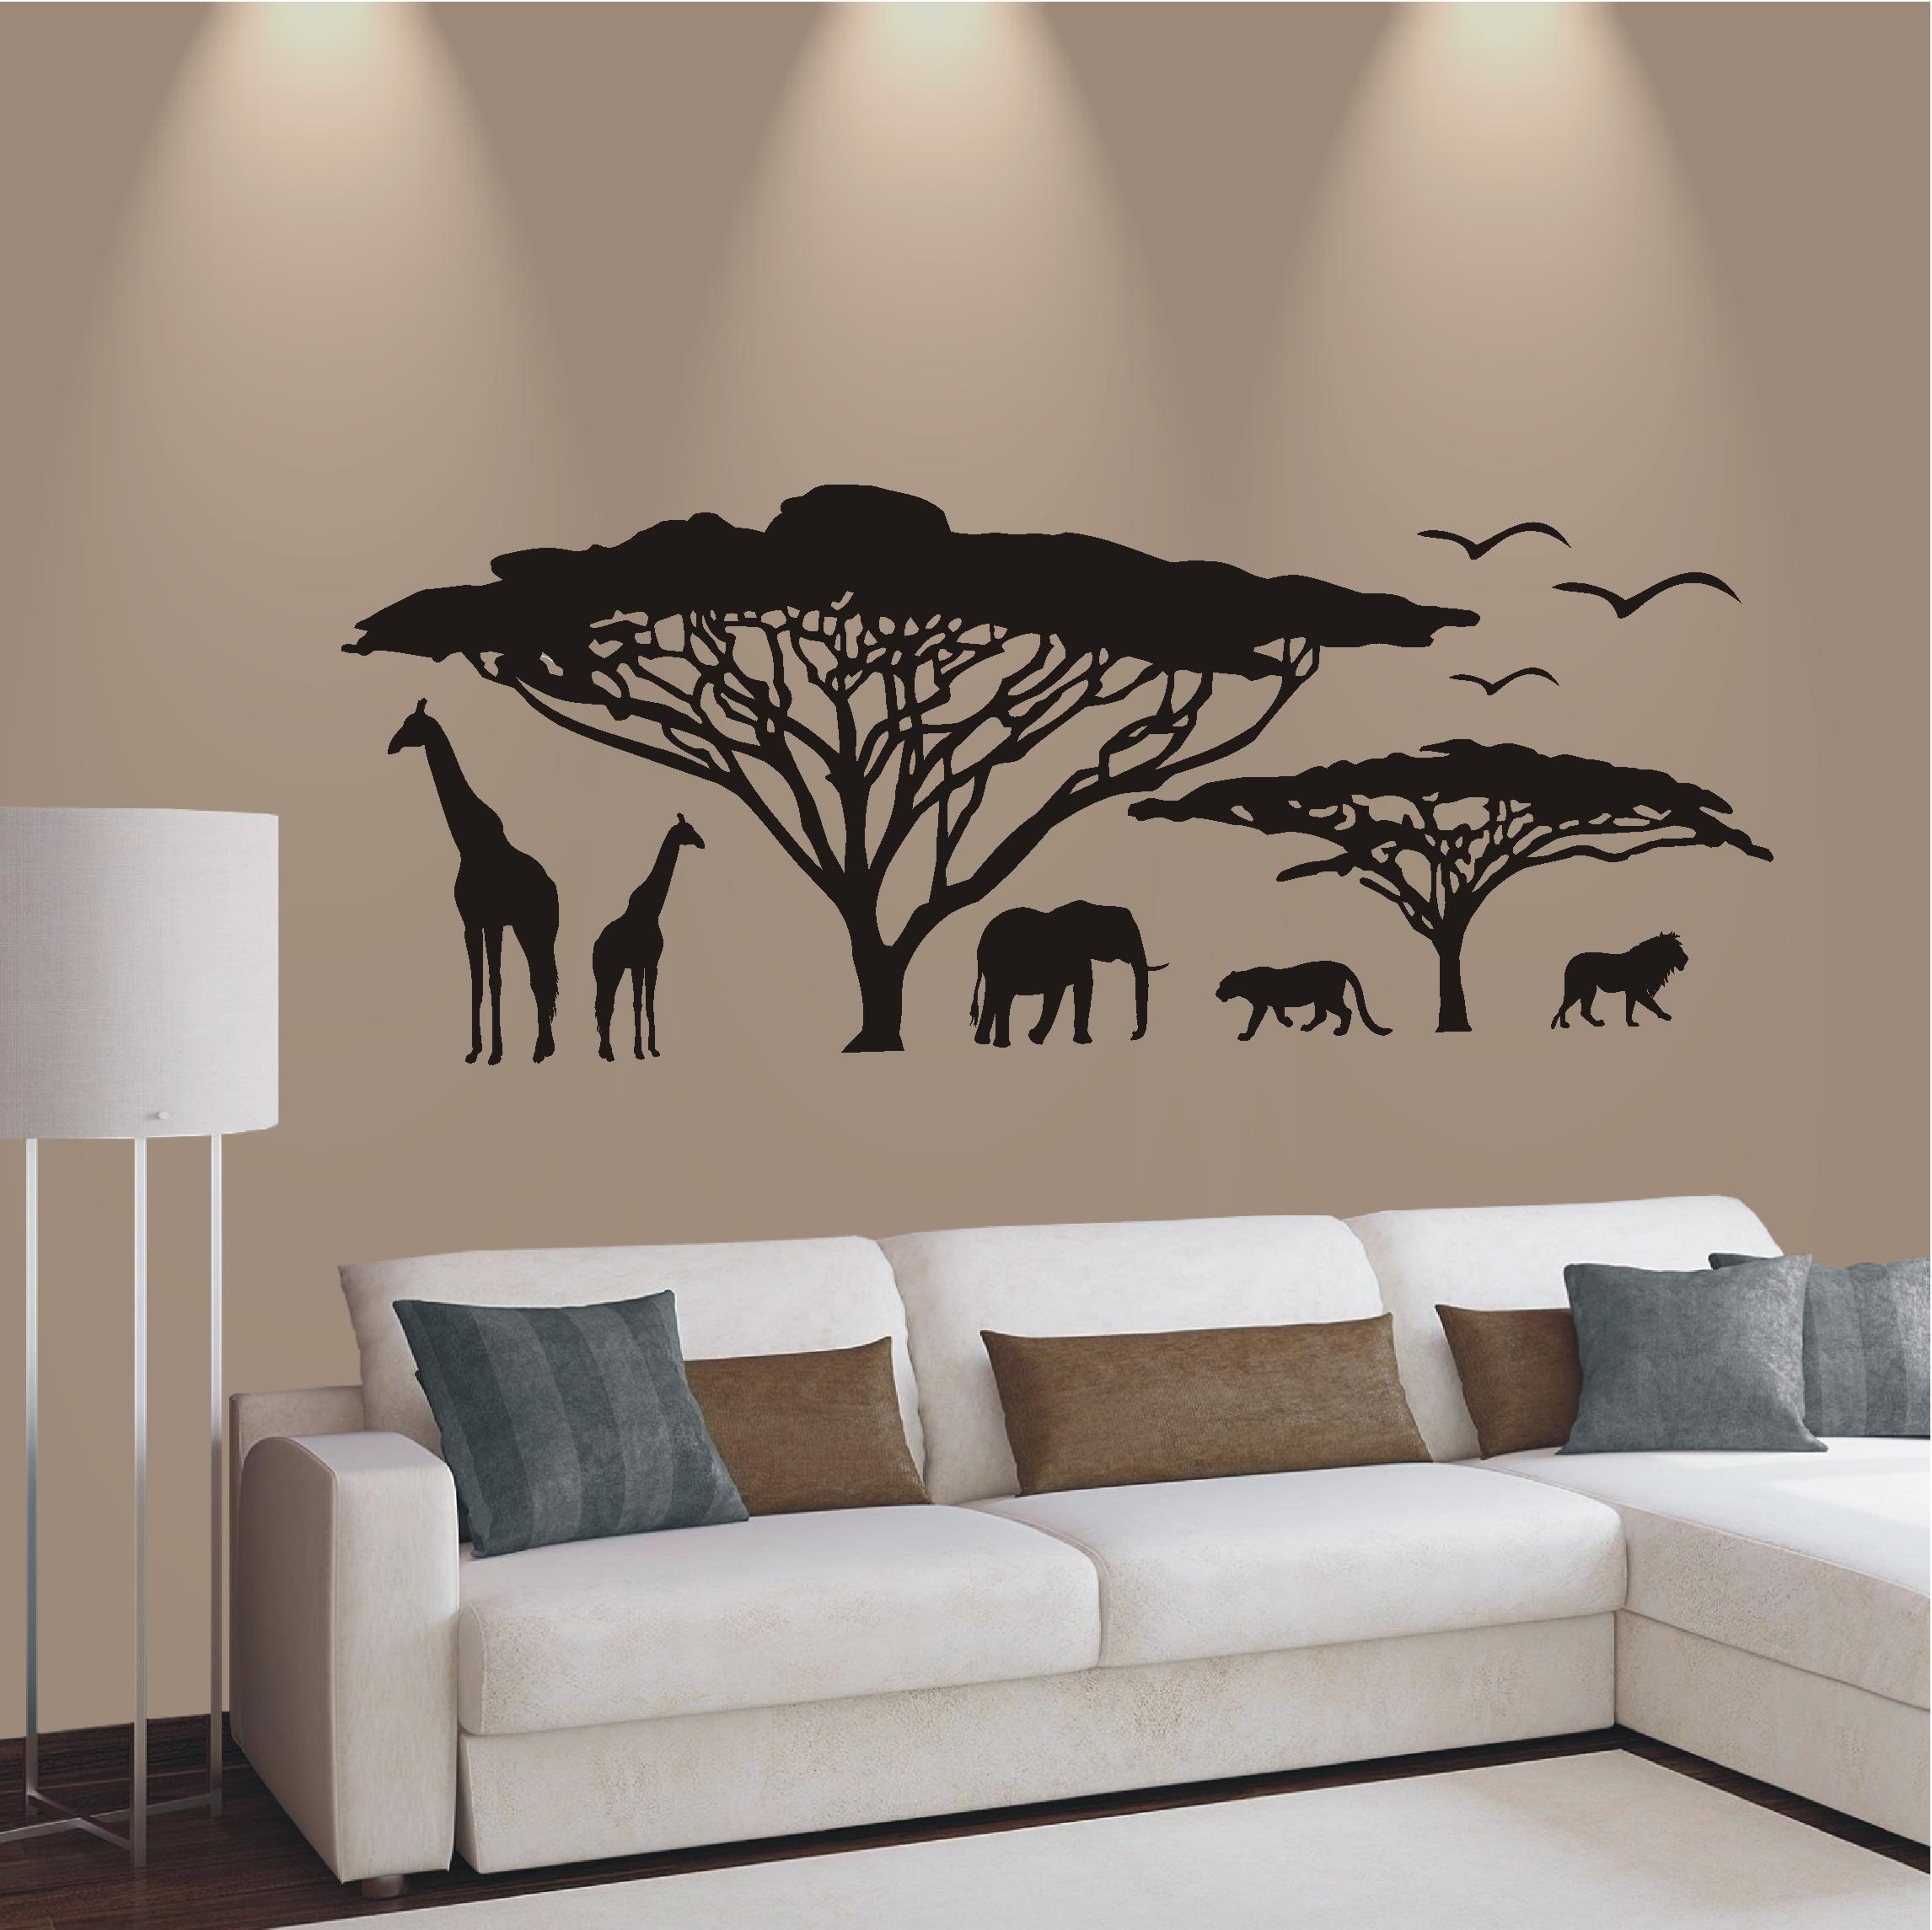 wandtattoo wandaufkleber afrika landschaft steppe savanne. Black Bedroom Furniture Sets. Home Design Ideas